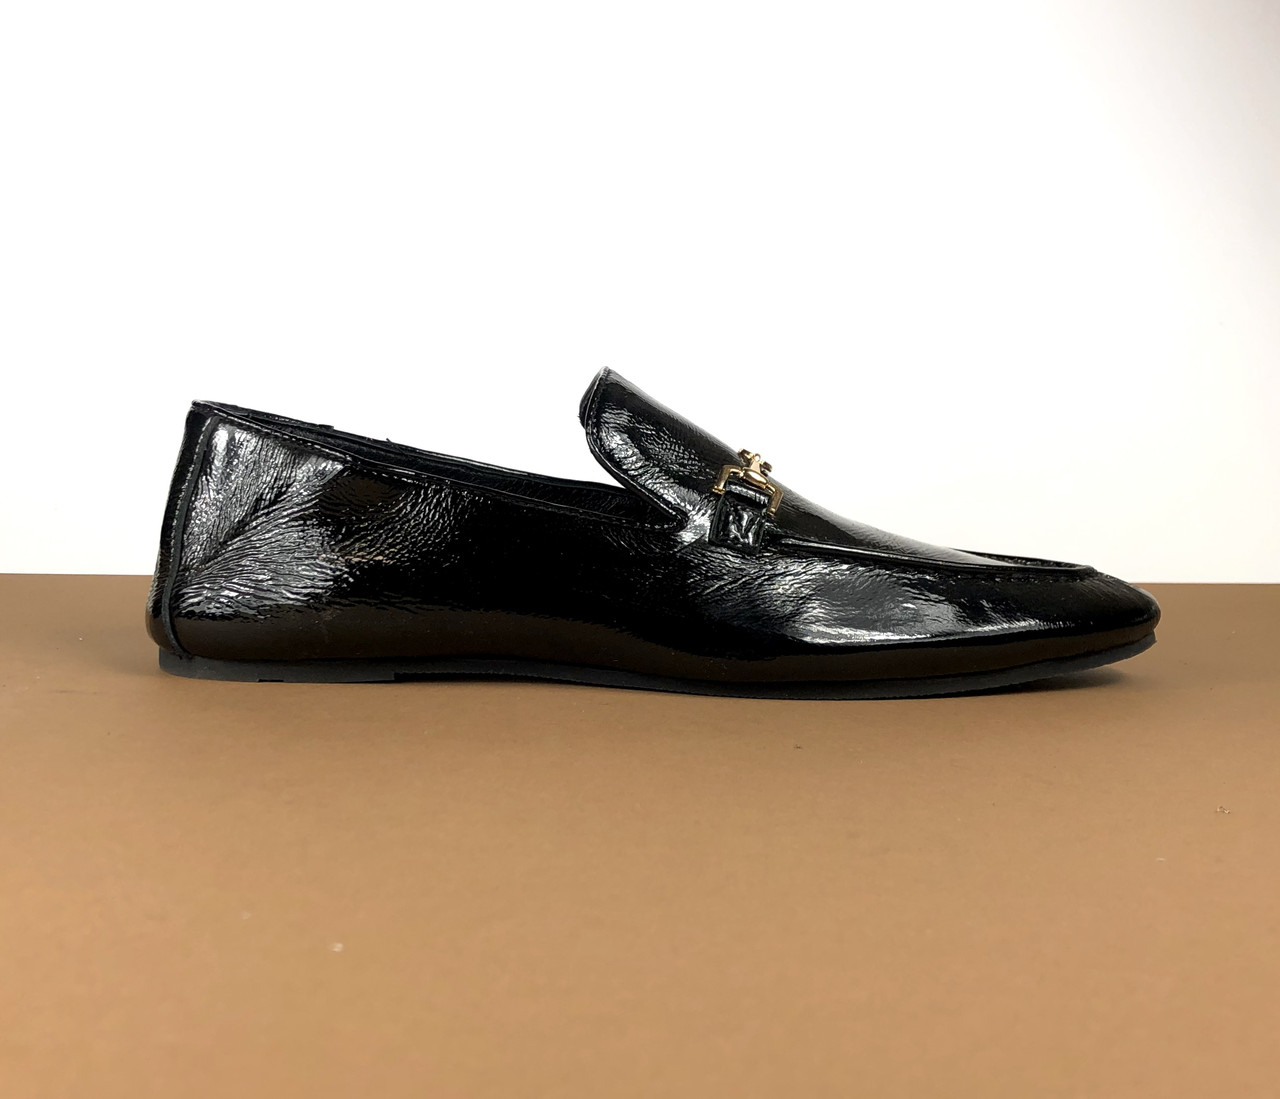 Лоферы мужские Louis Vuitton (Луи Виттон) арт. 39-21